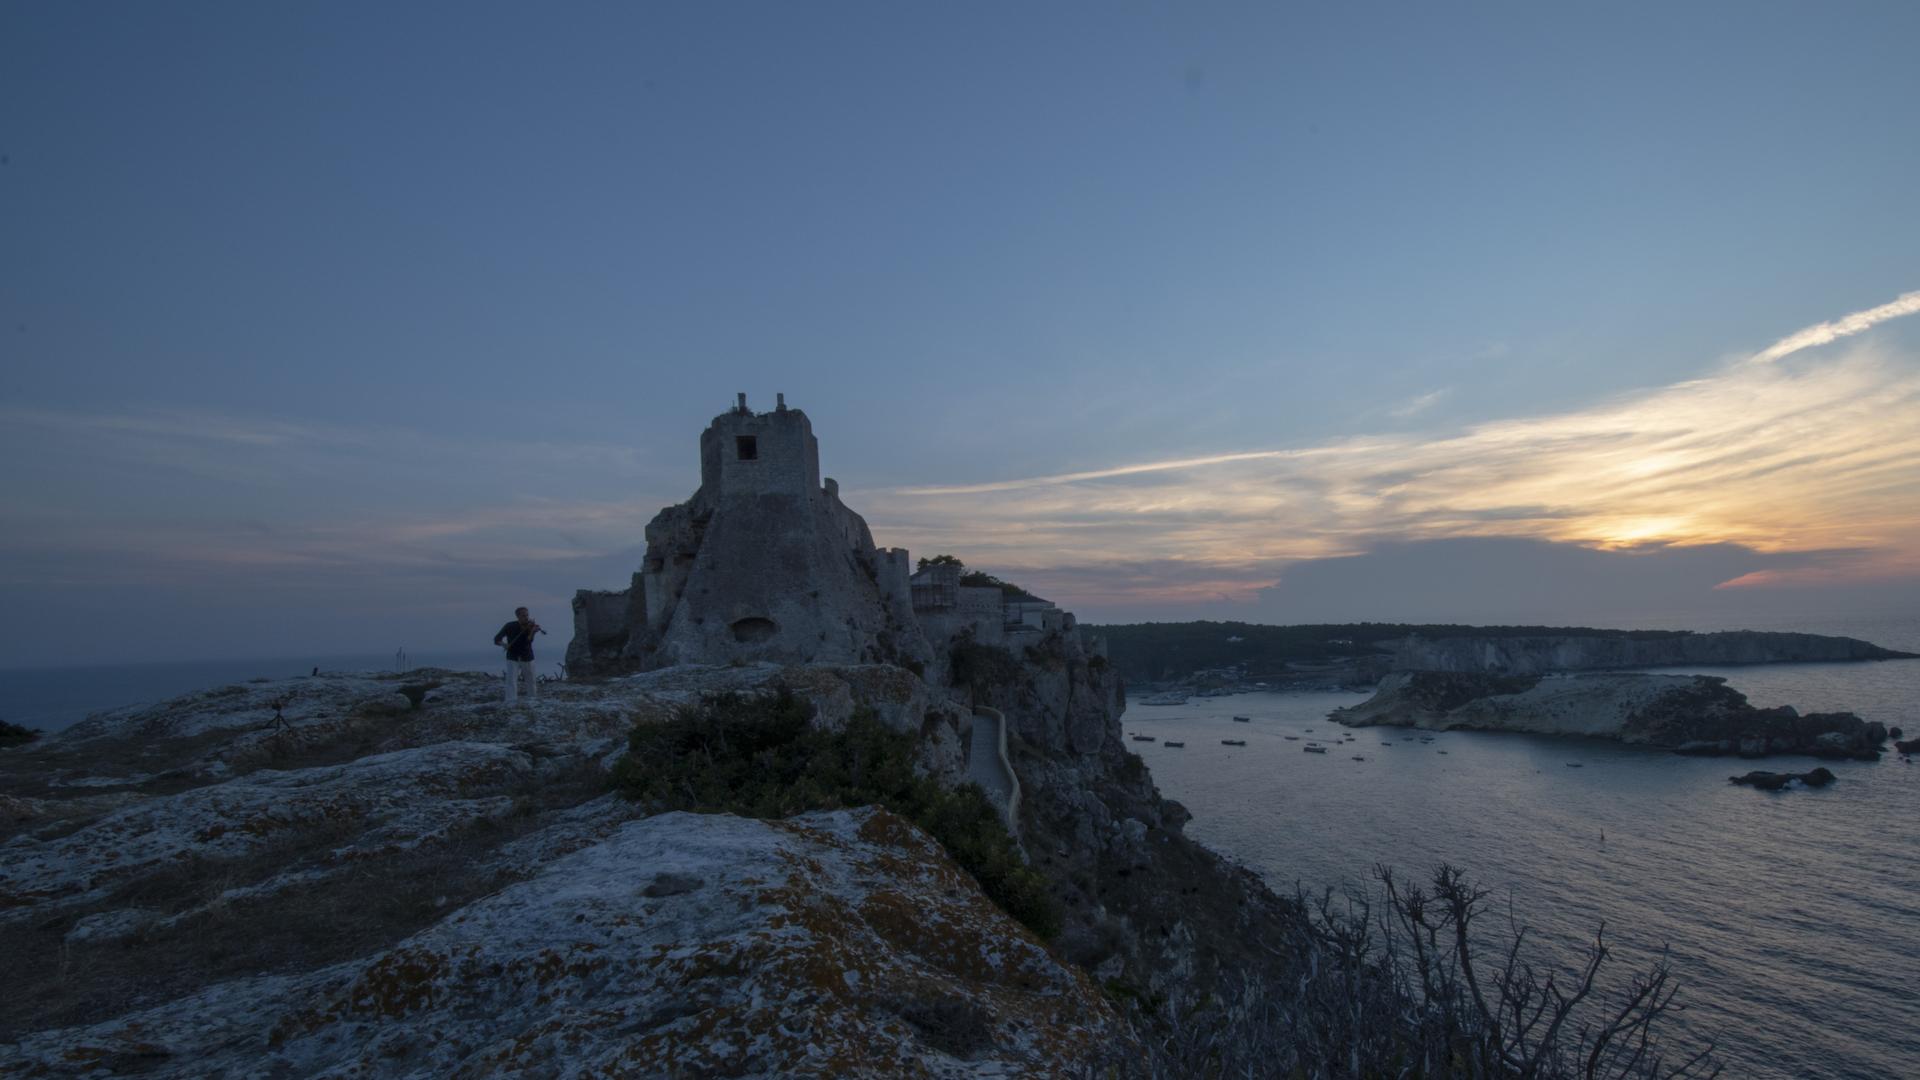 Tremiti Islands - Photo By Fabio Silvestri